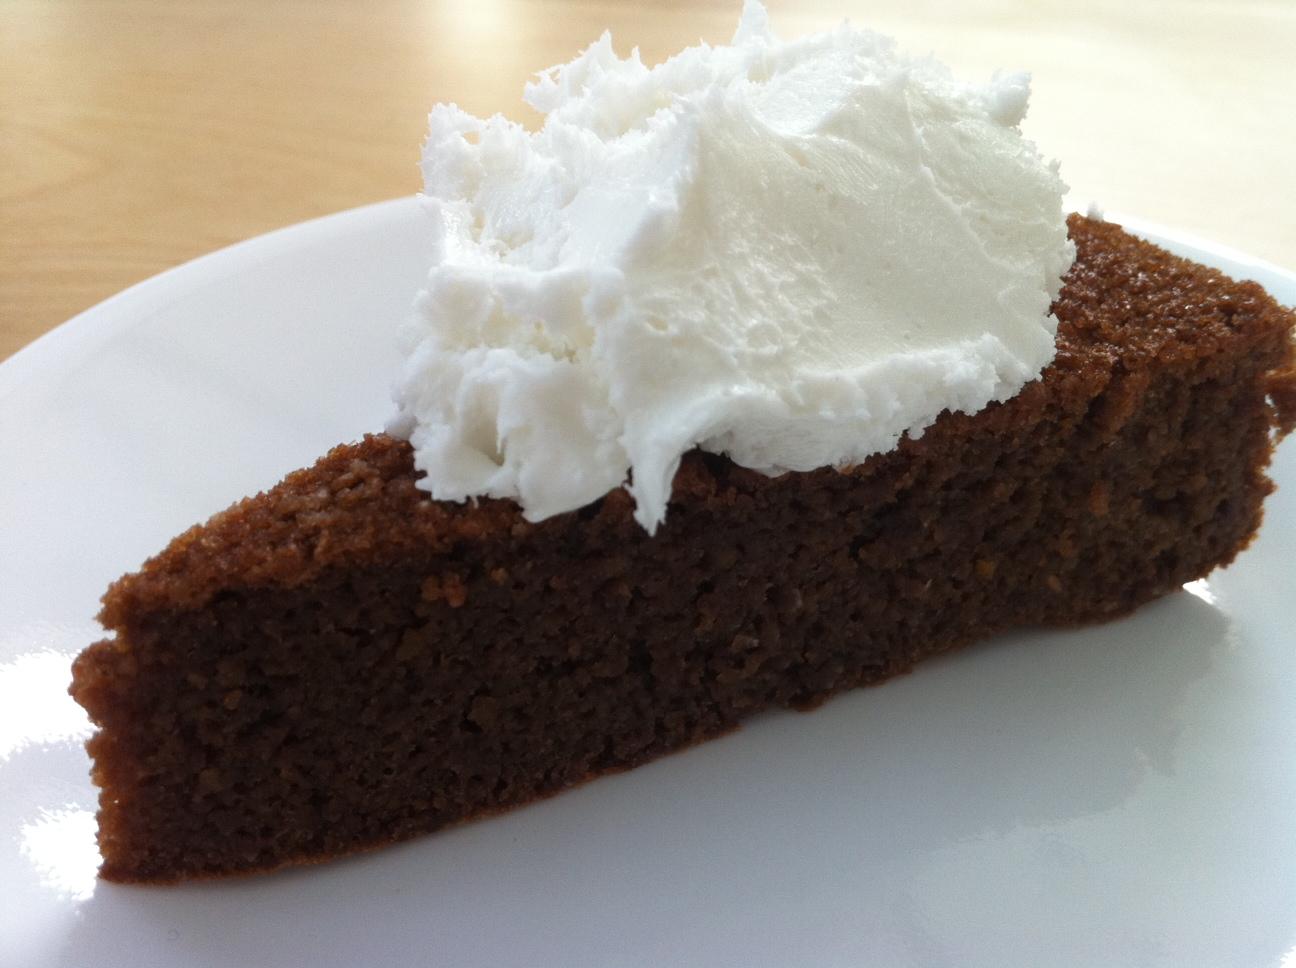 Pin Garbanzo Bean Chocolate Cake The Crunchy Mamacita Cake ...